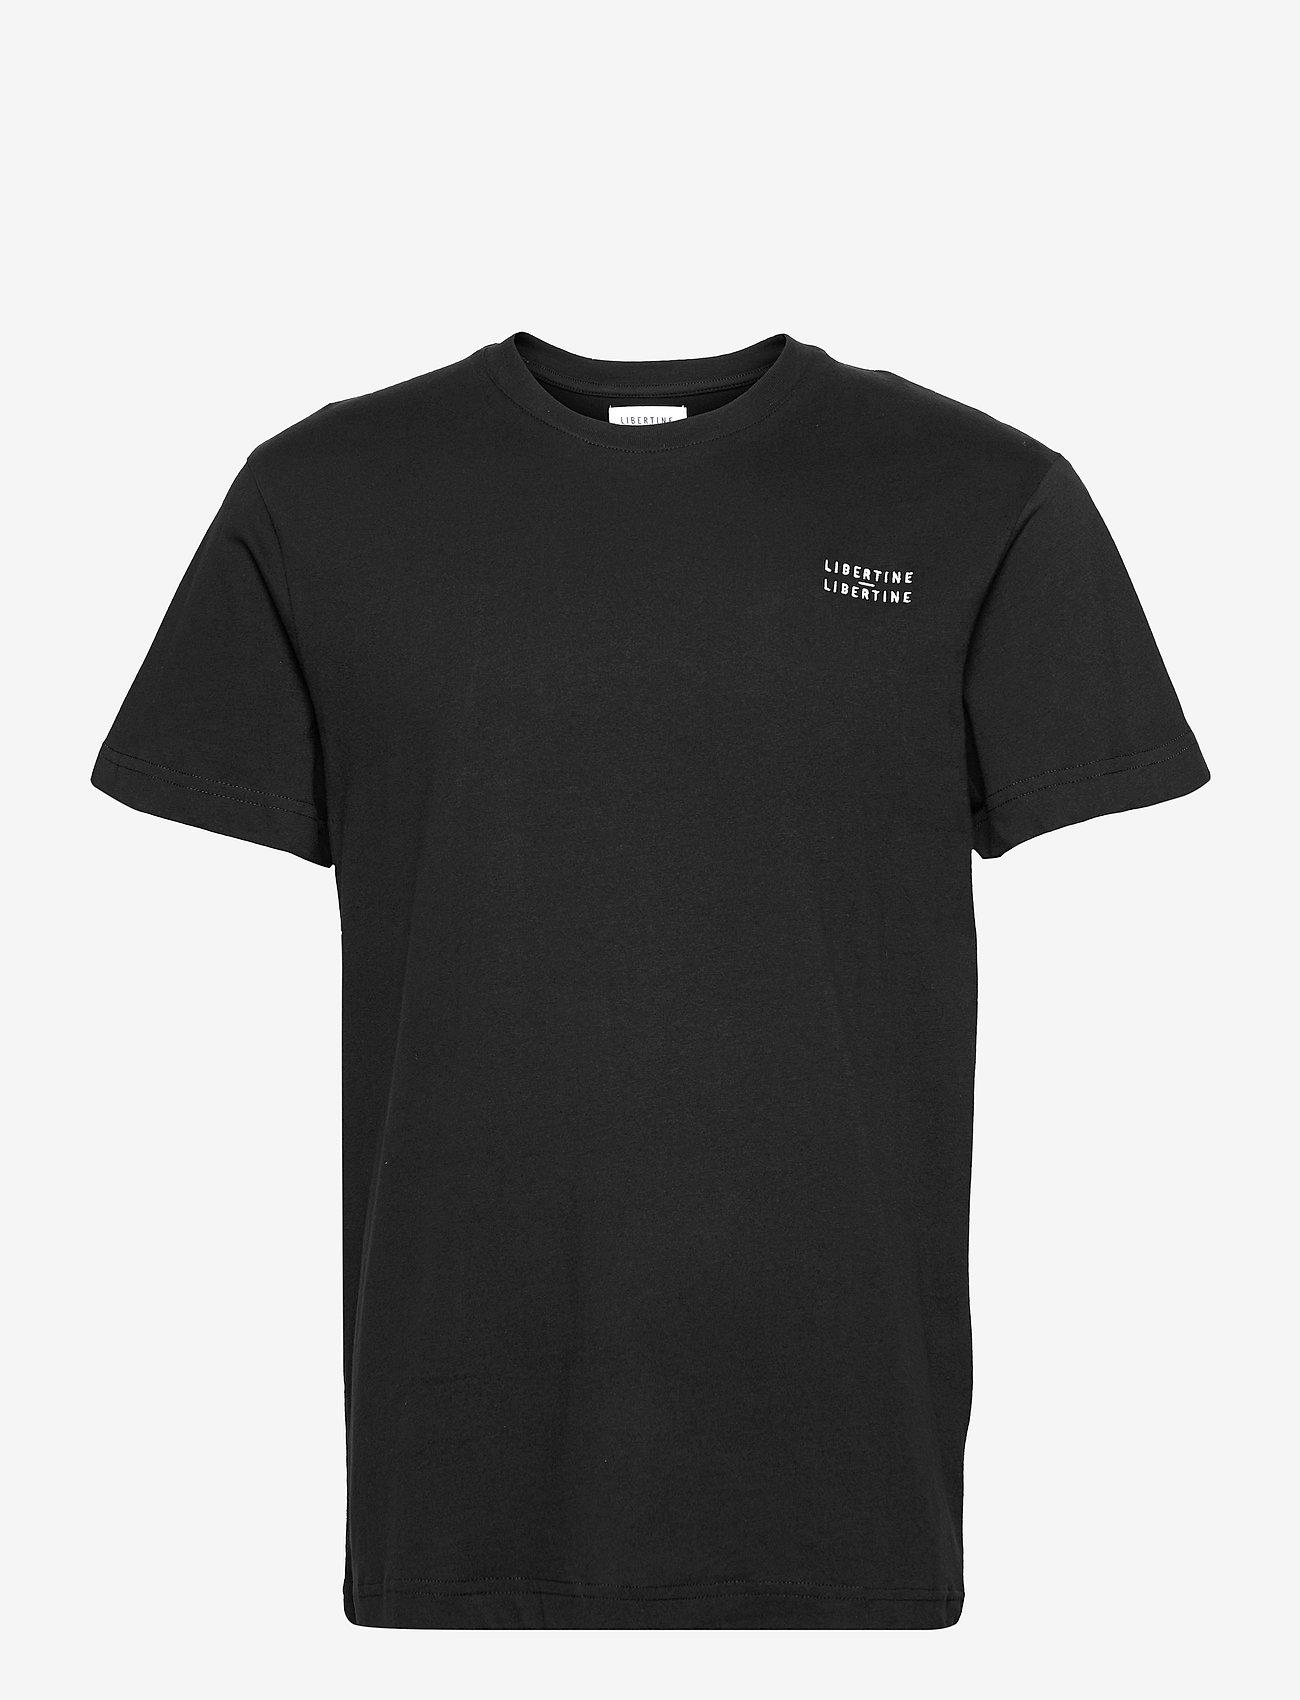 Libertine-Libertine - Beat L-L - basic t-shirts - black - 0